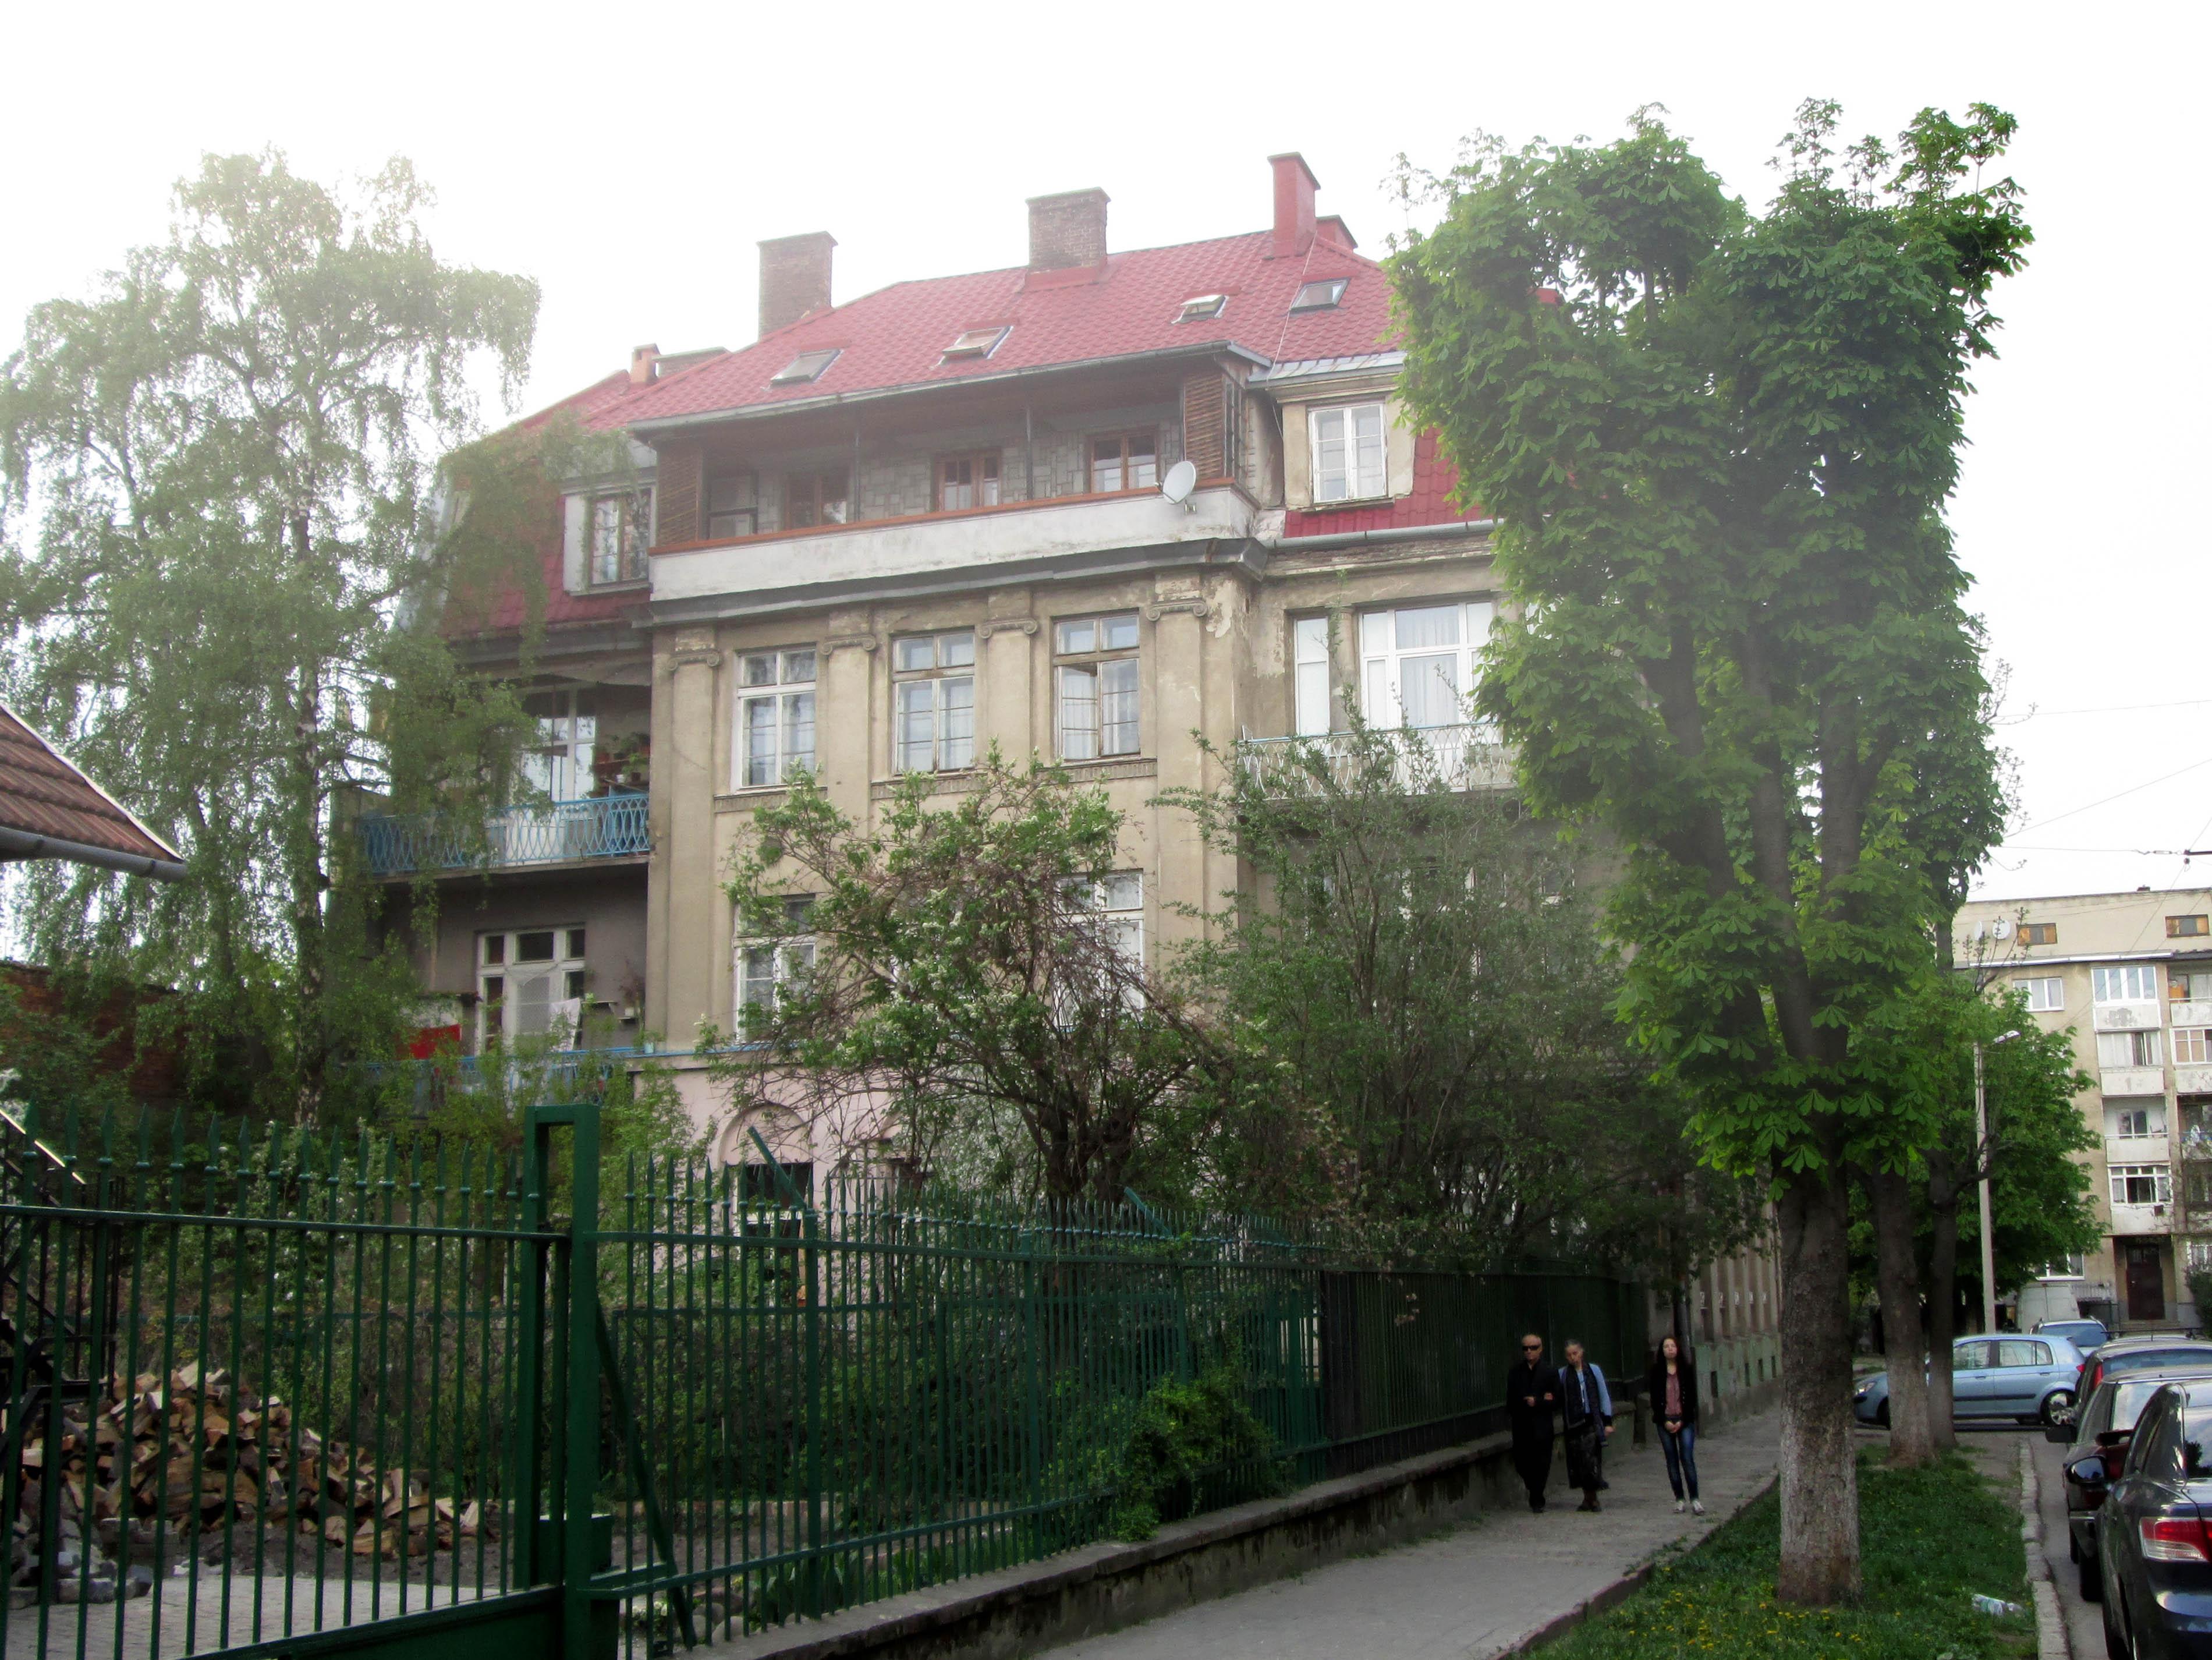 Файл:11 Zhukovskoho Street, Lviv (01).jpg — Вікіпедія